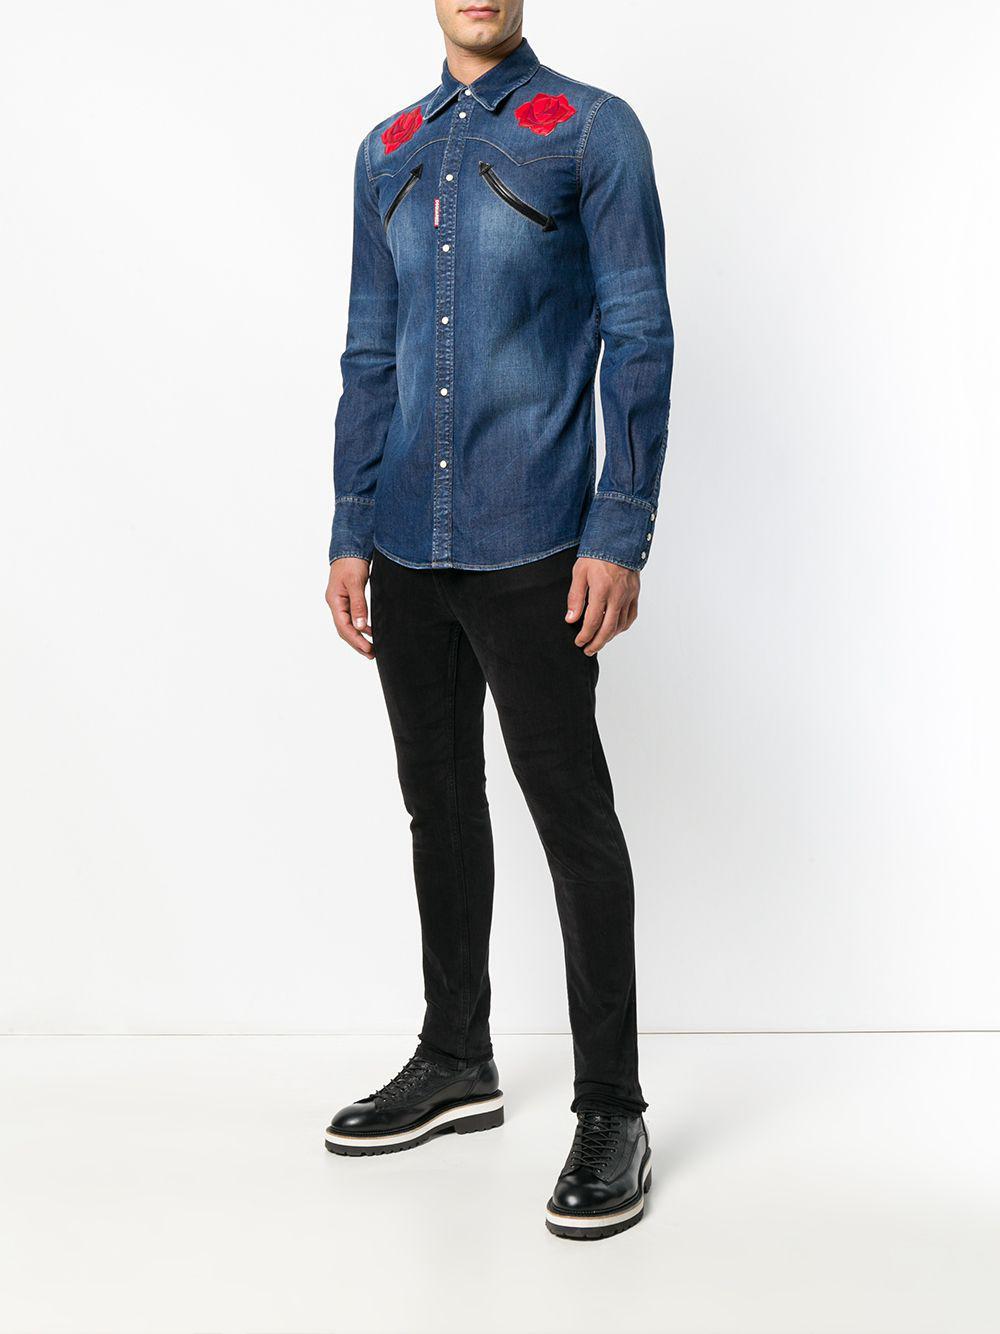 96c0a3bf4dd9d2 DSquared² Flower Denim Shirt in Blue for Men - Lyst